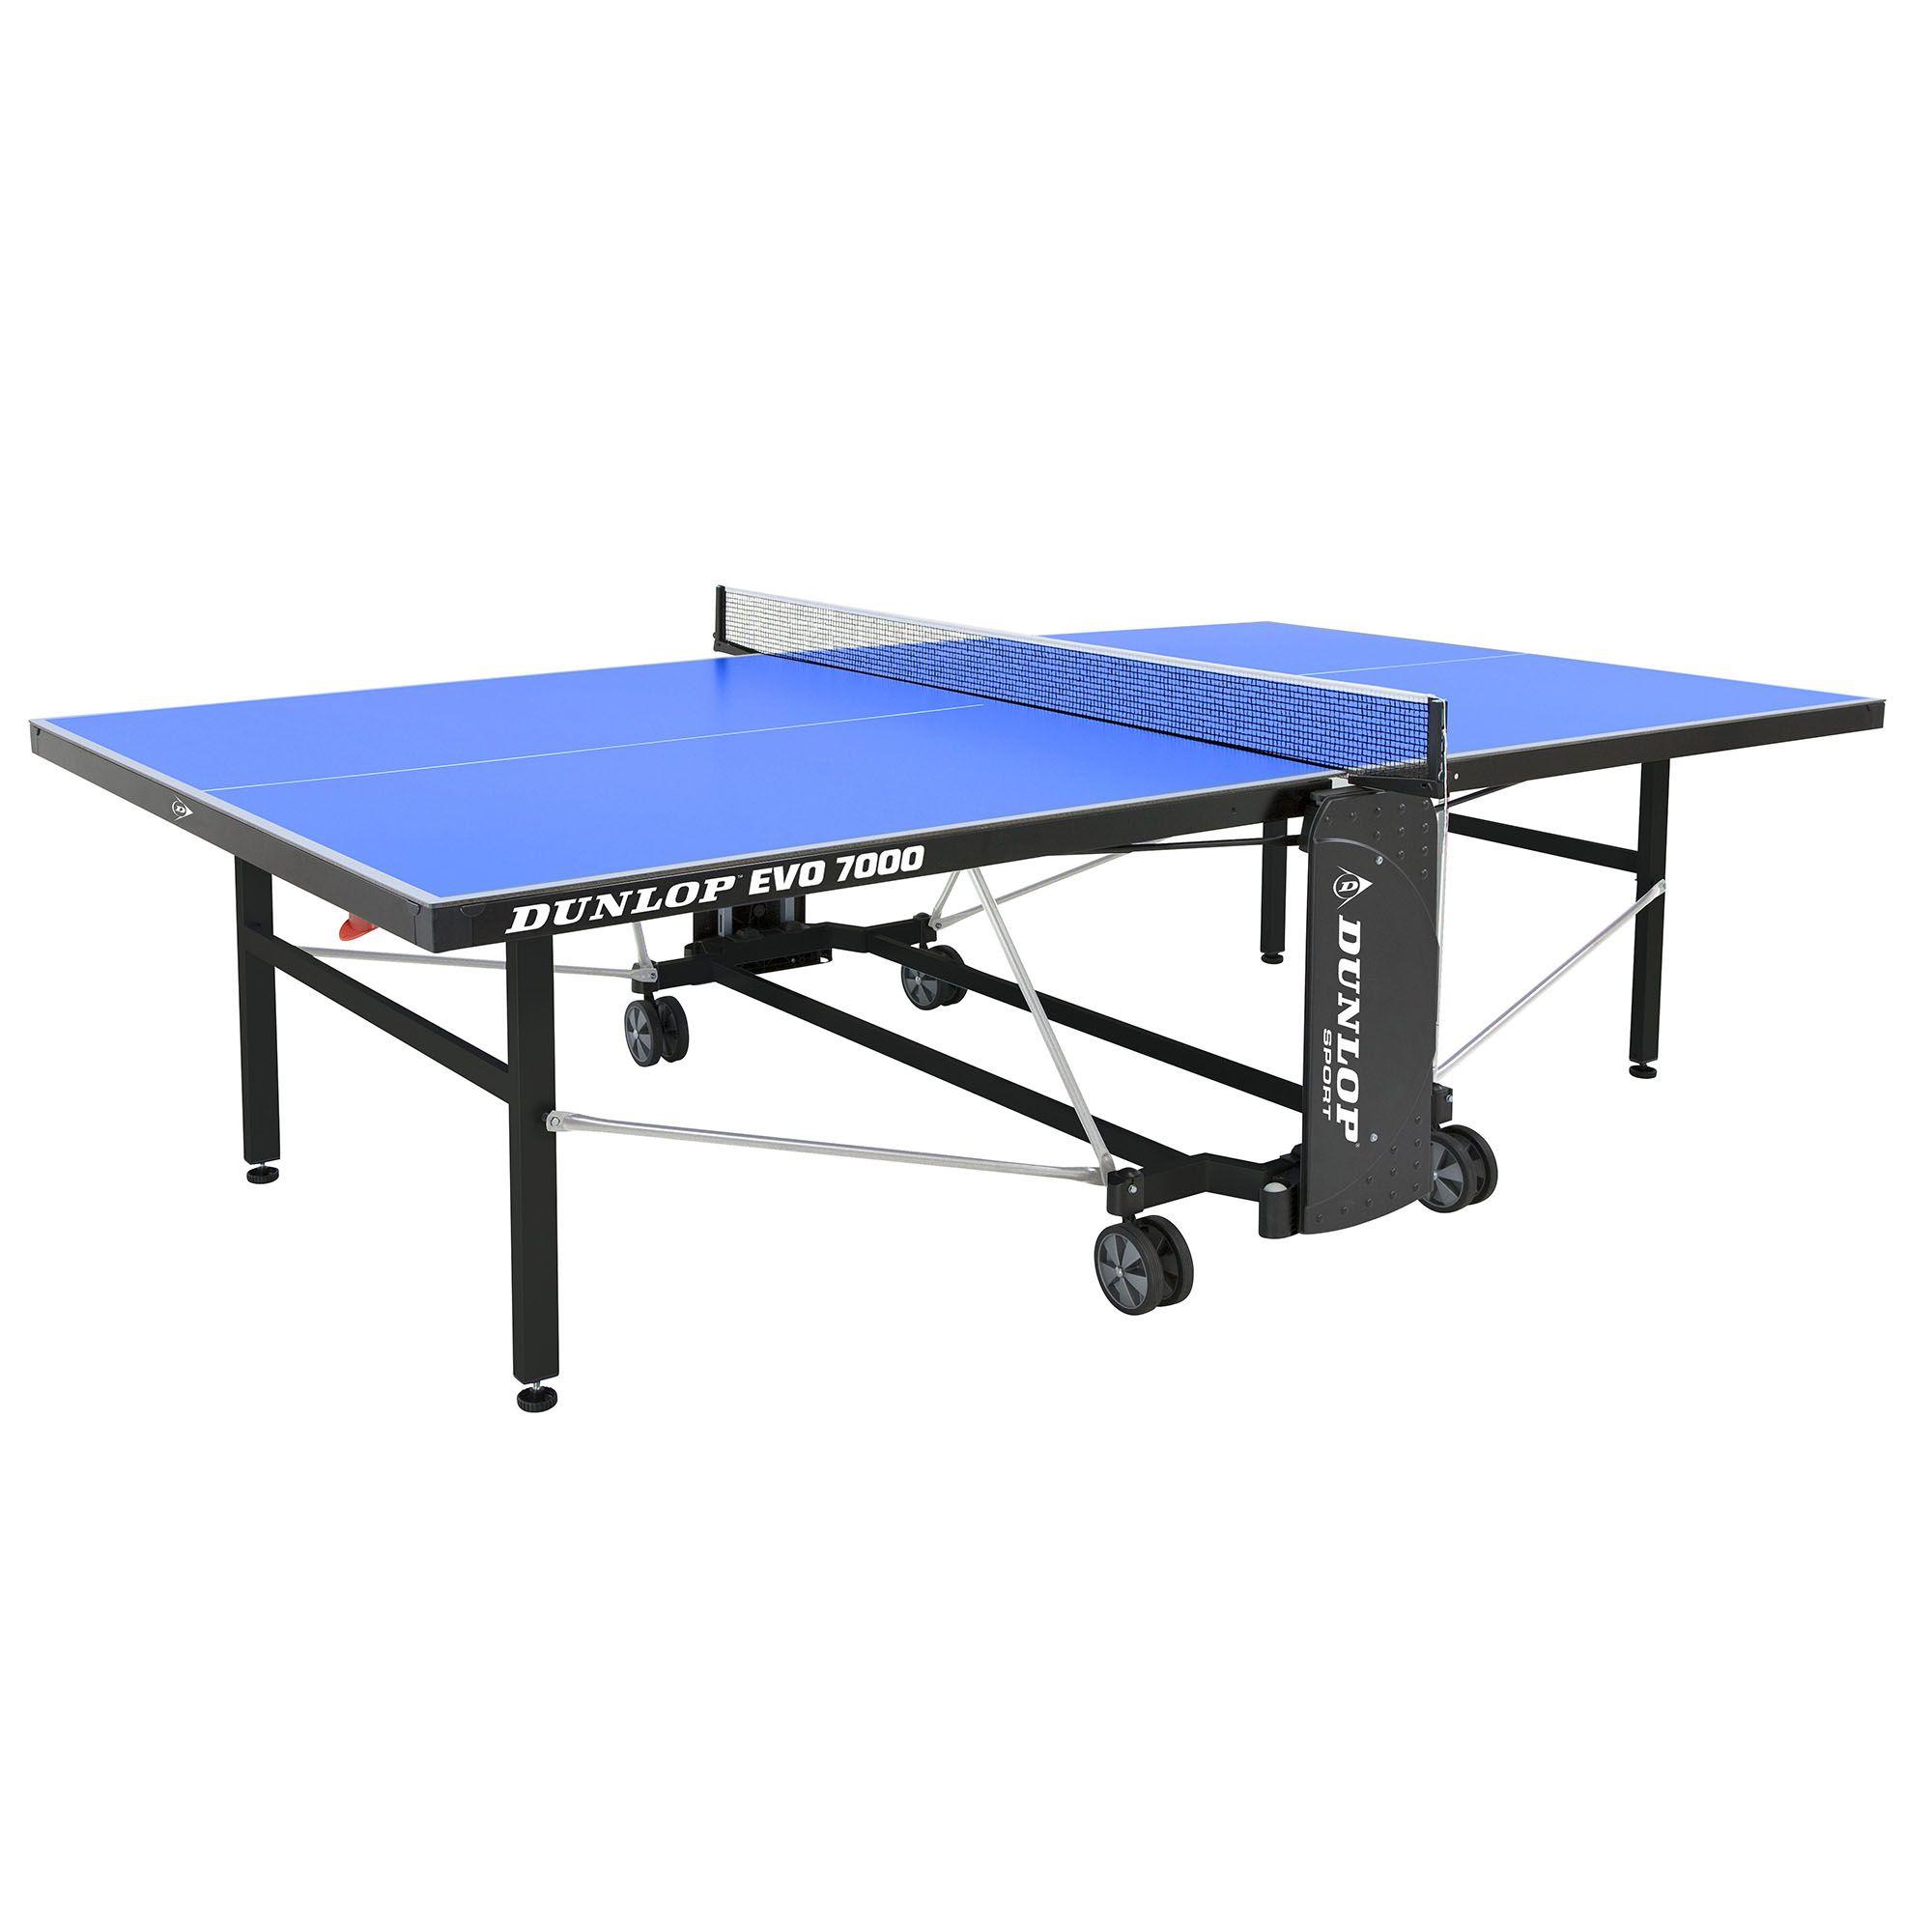 Dunlop evo 7000 outdoor table tennis table - Outdoor table tennis table reviews ...